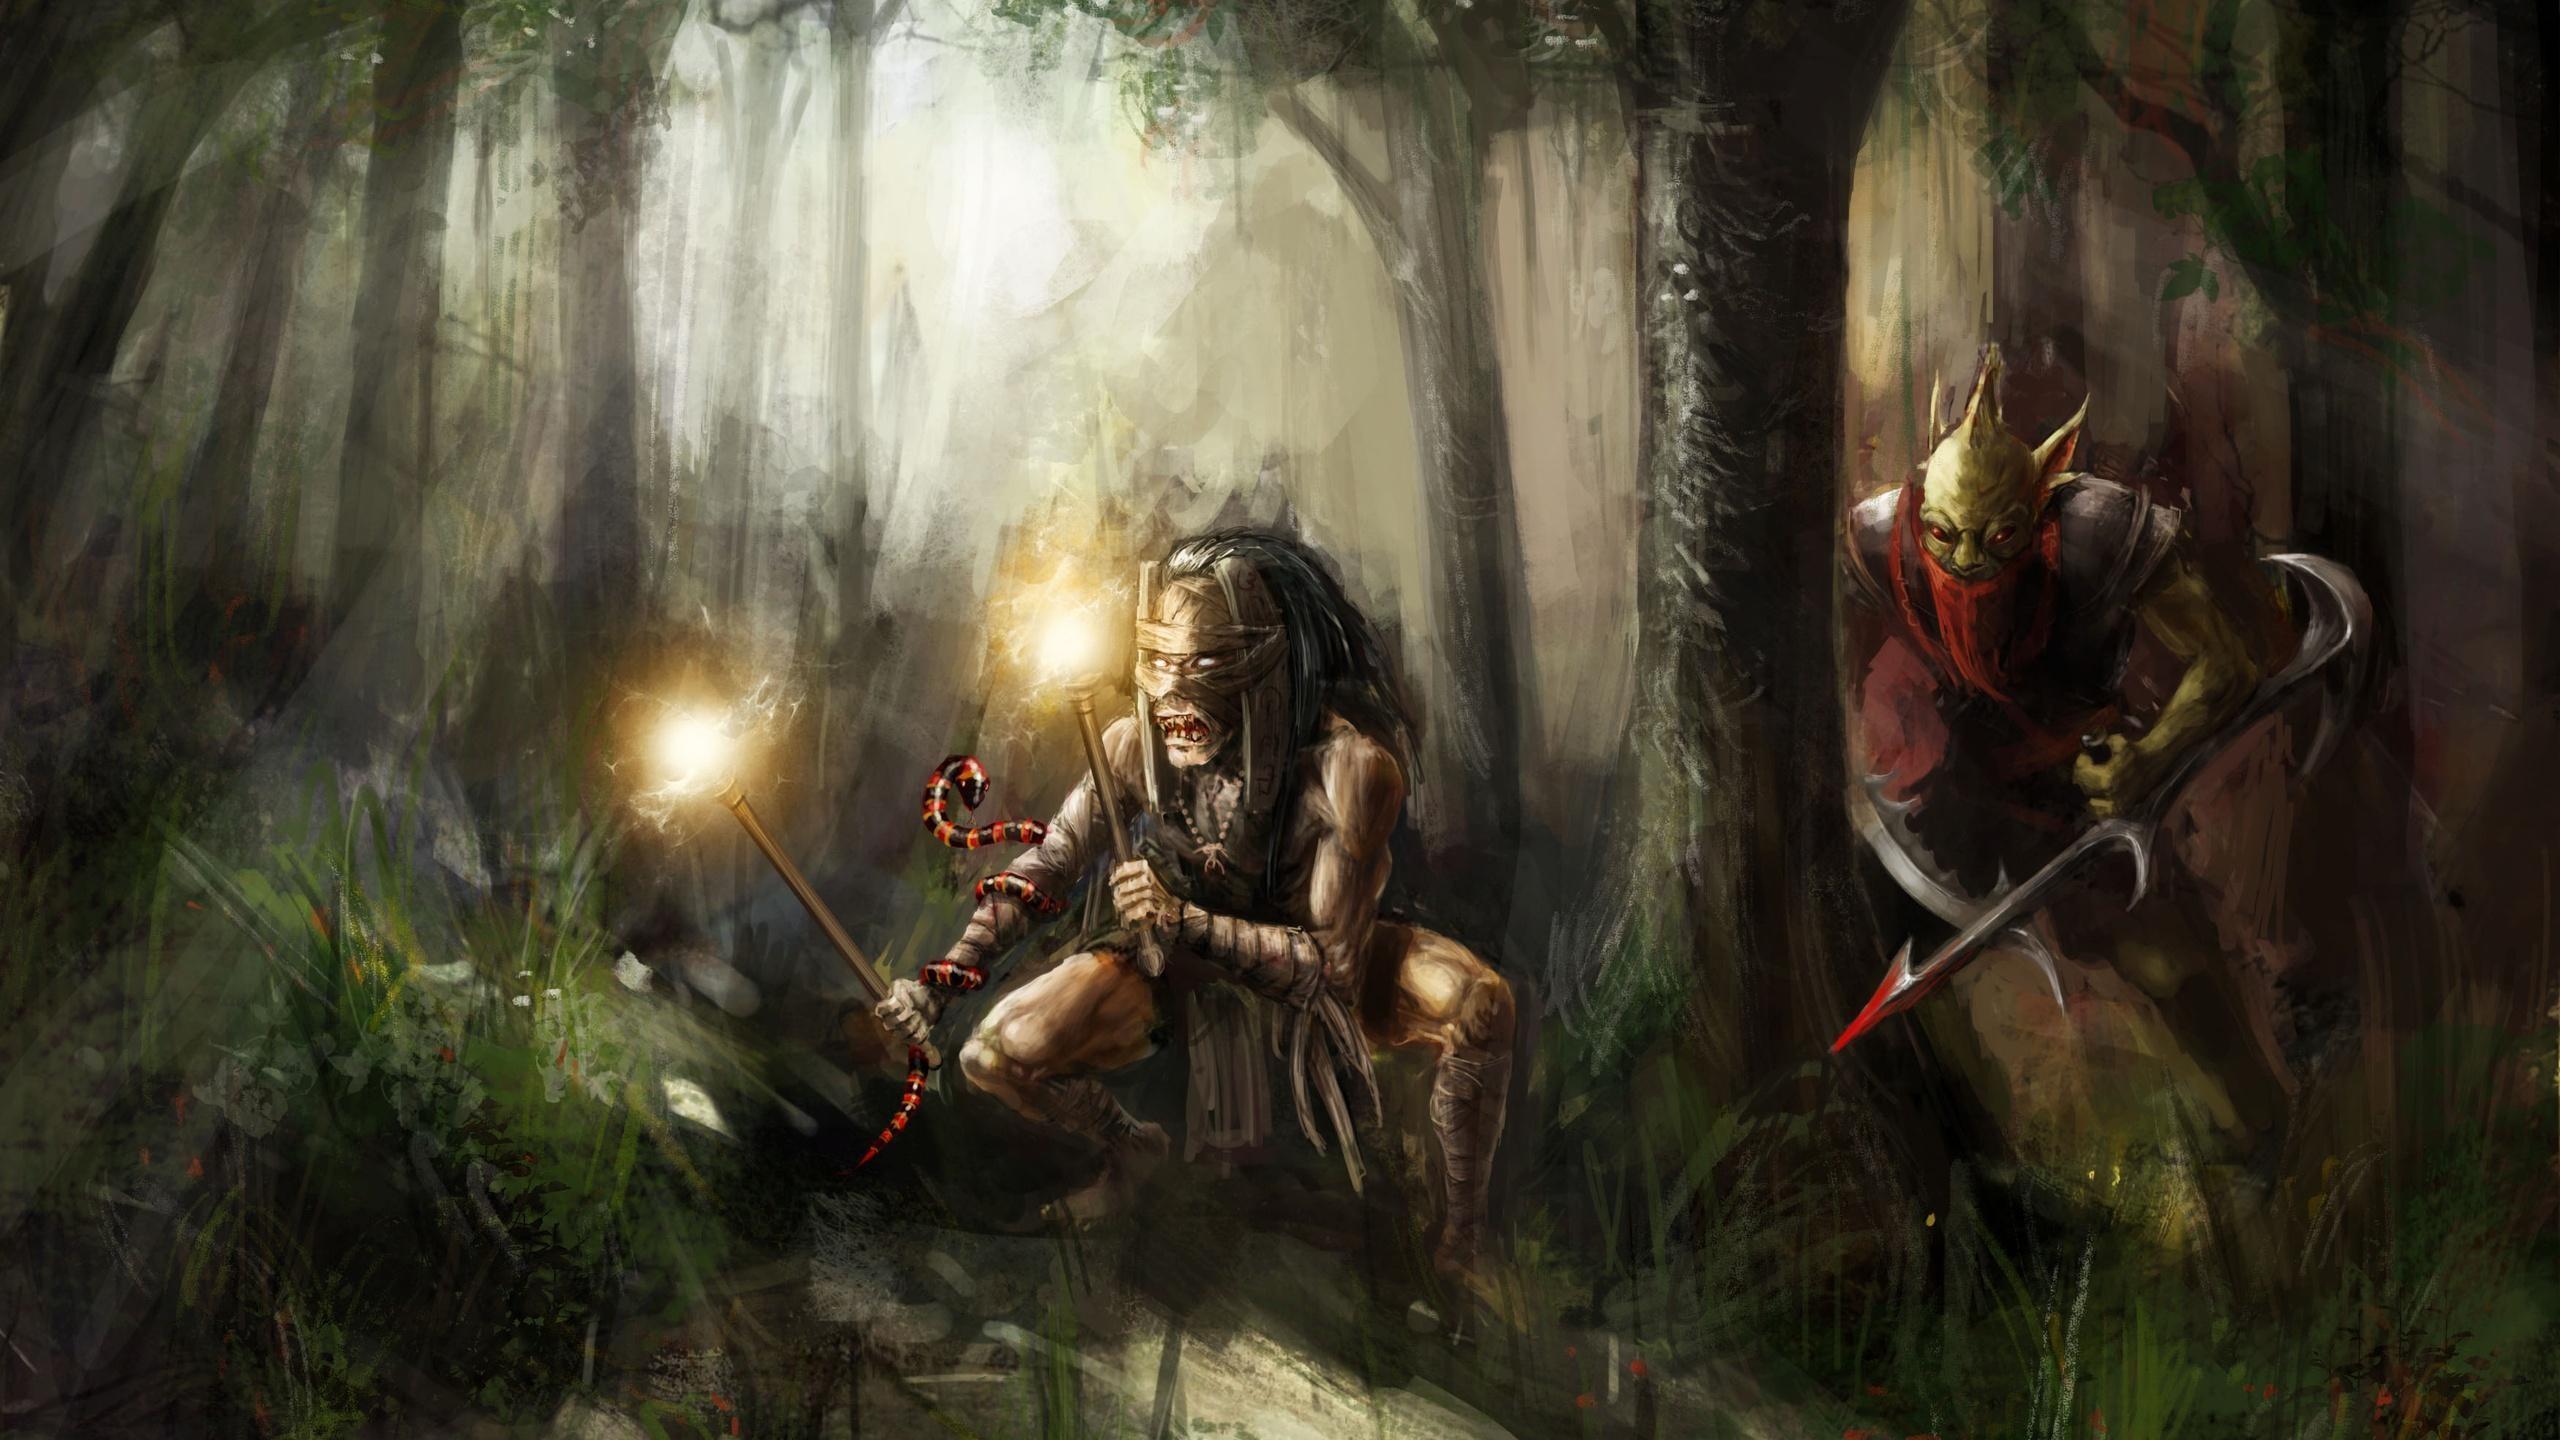 Res: 2560x1440, bounty hunter, shadow shaman, dota 2